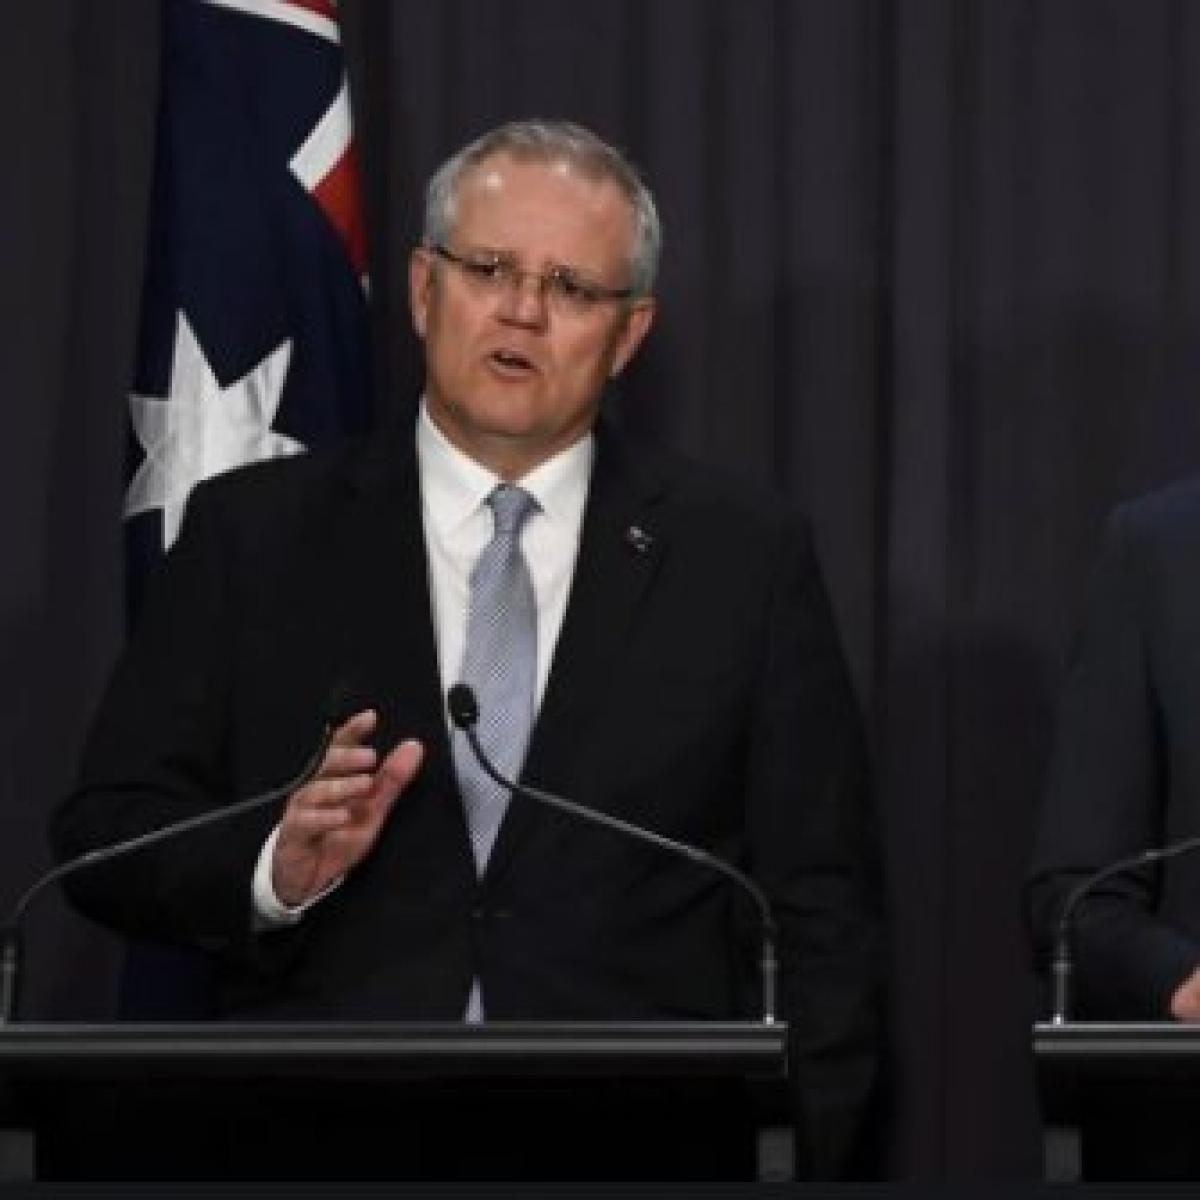 Australia: Scott Morrison faces fury over campaign ad